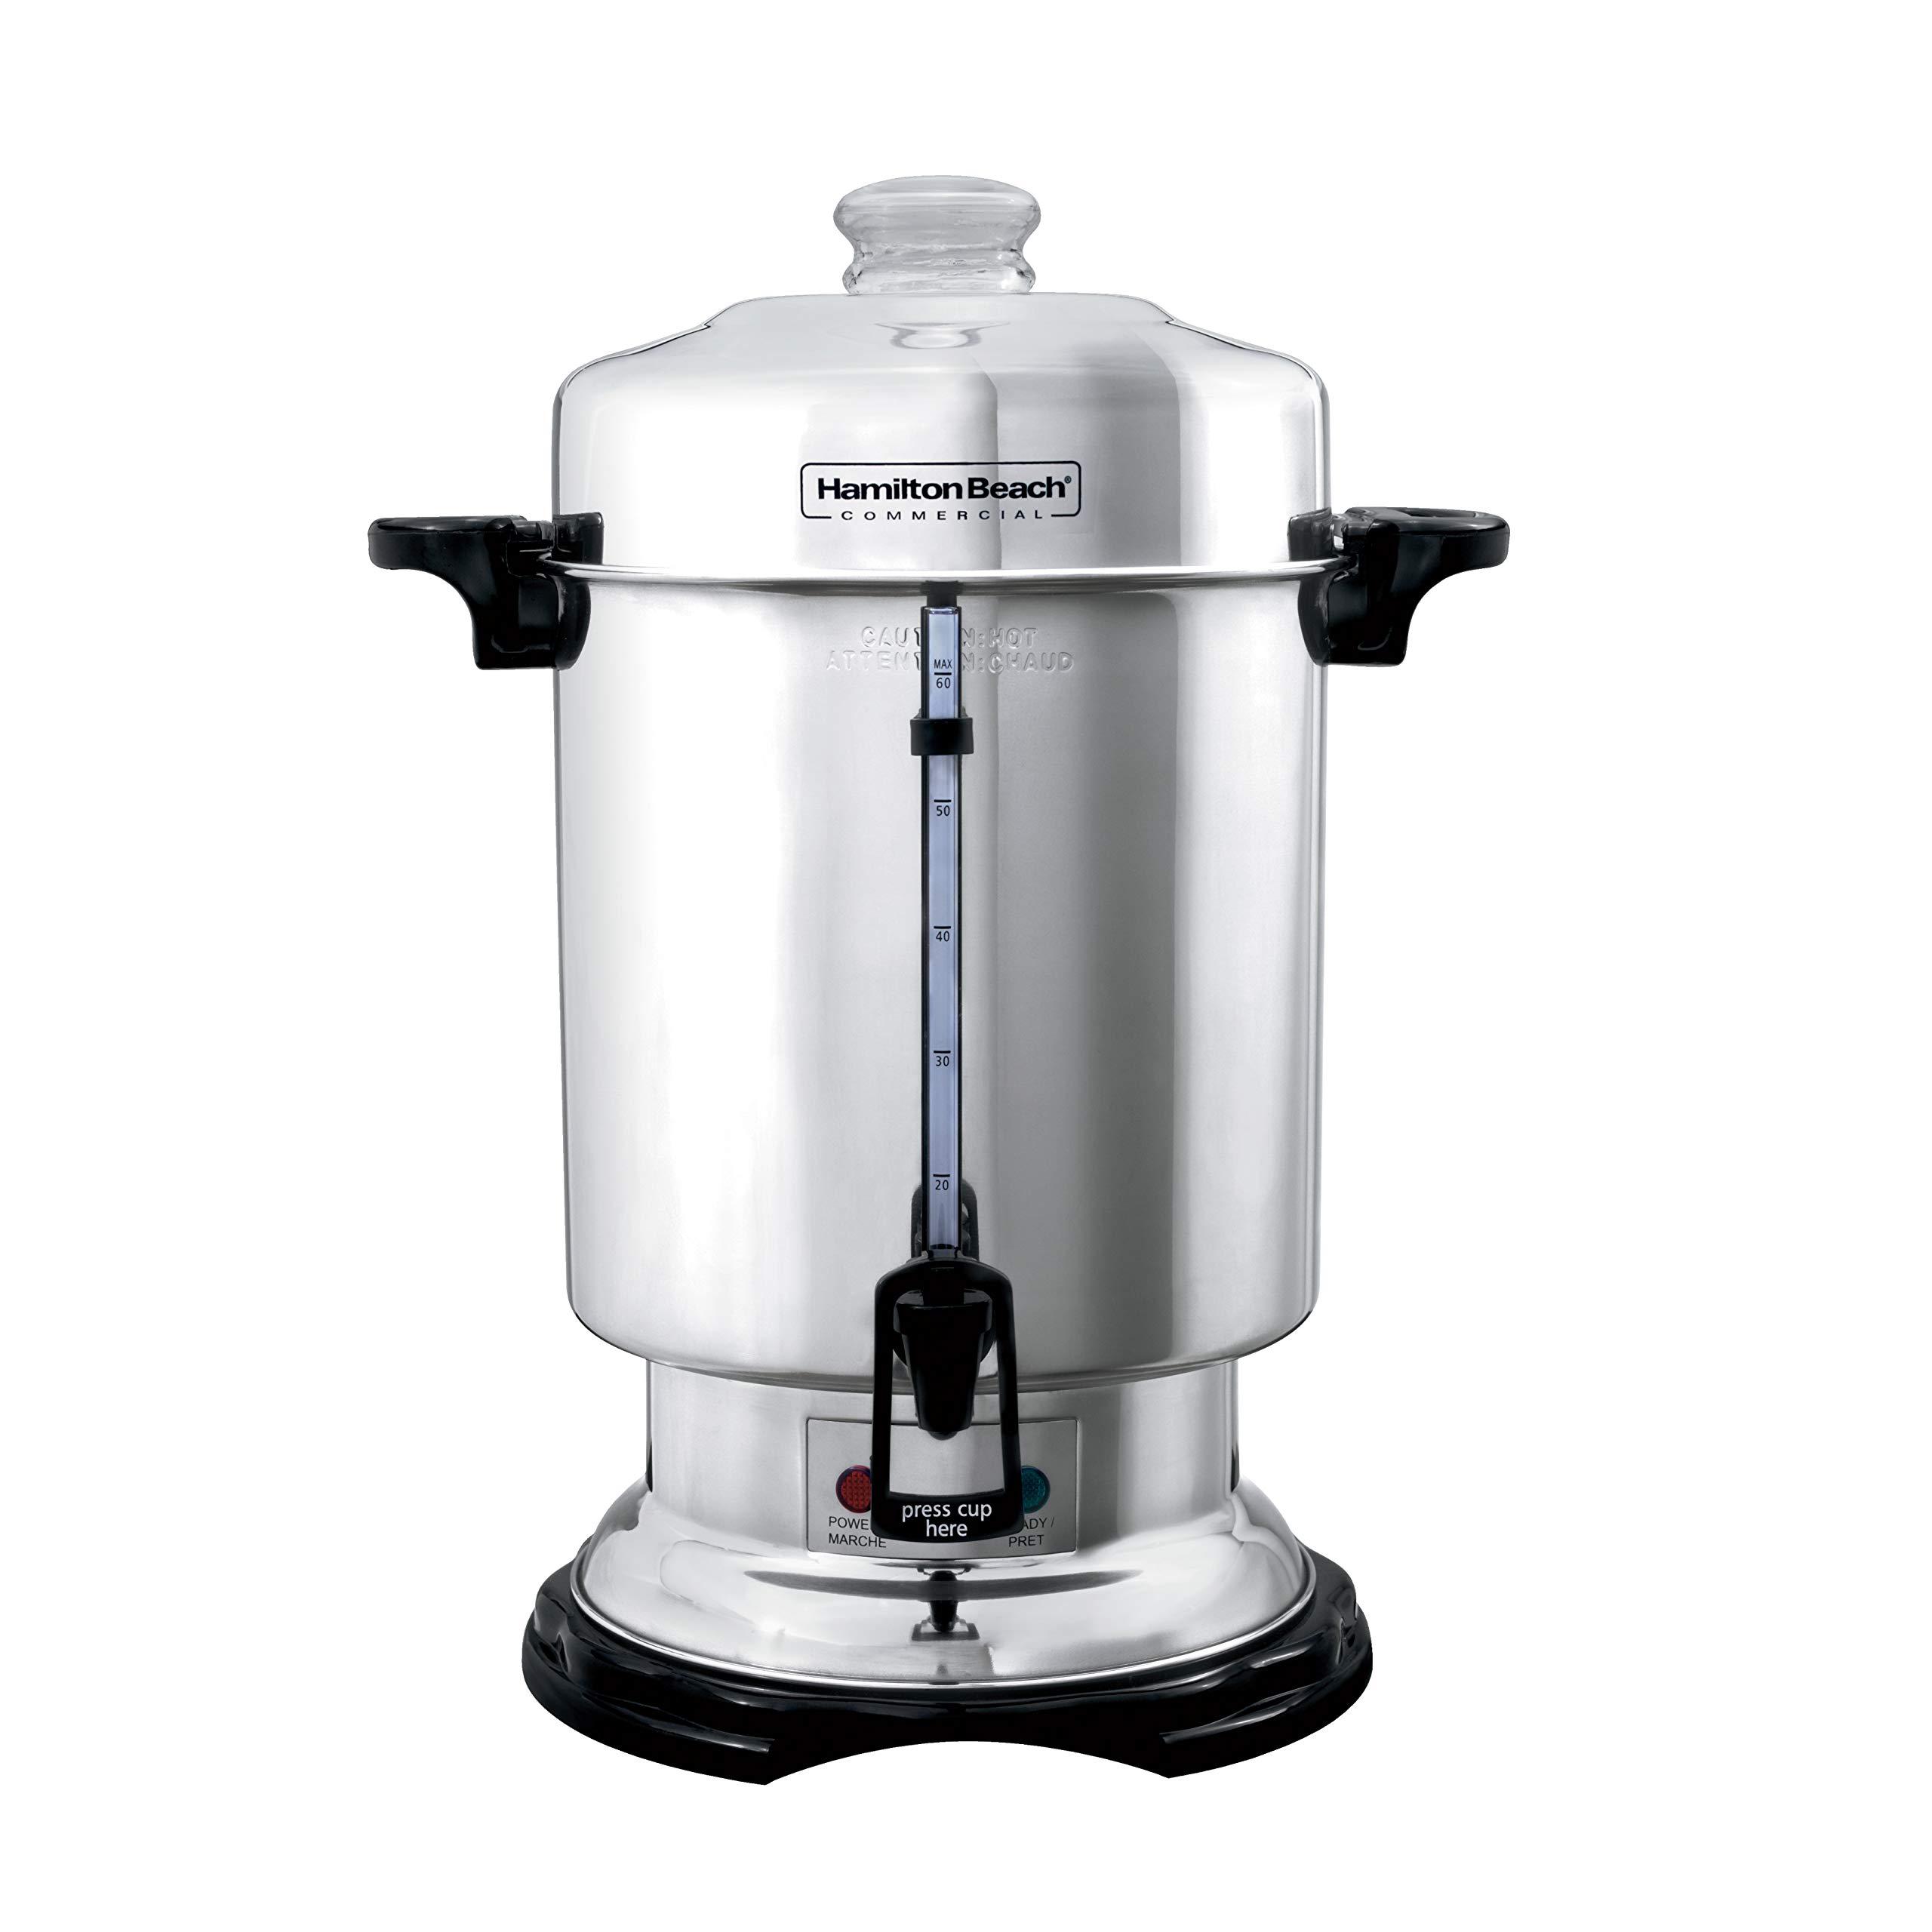 Hamilton Beach Commercial Stainless Steel Coffee Urn, 60 Cup Capacity D50065 by Hamilton Beach